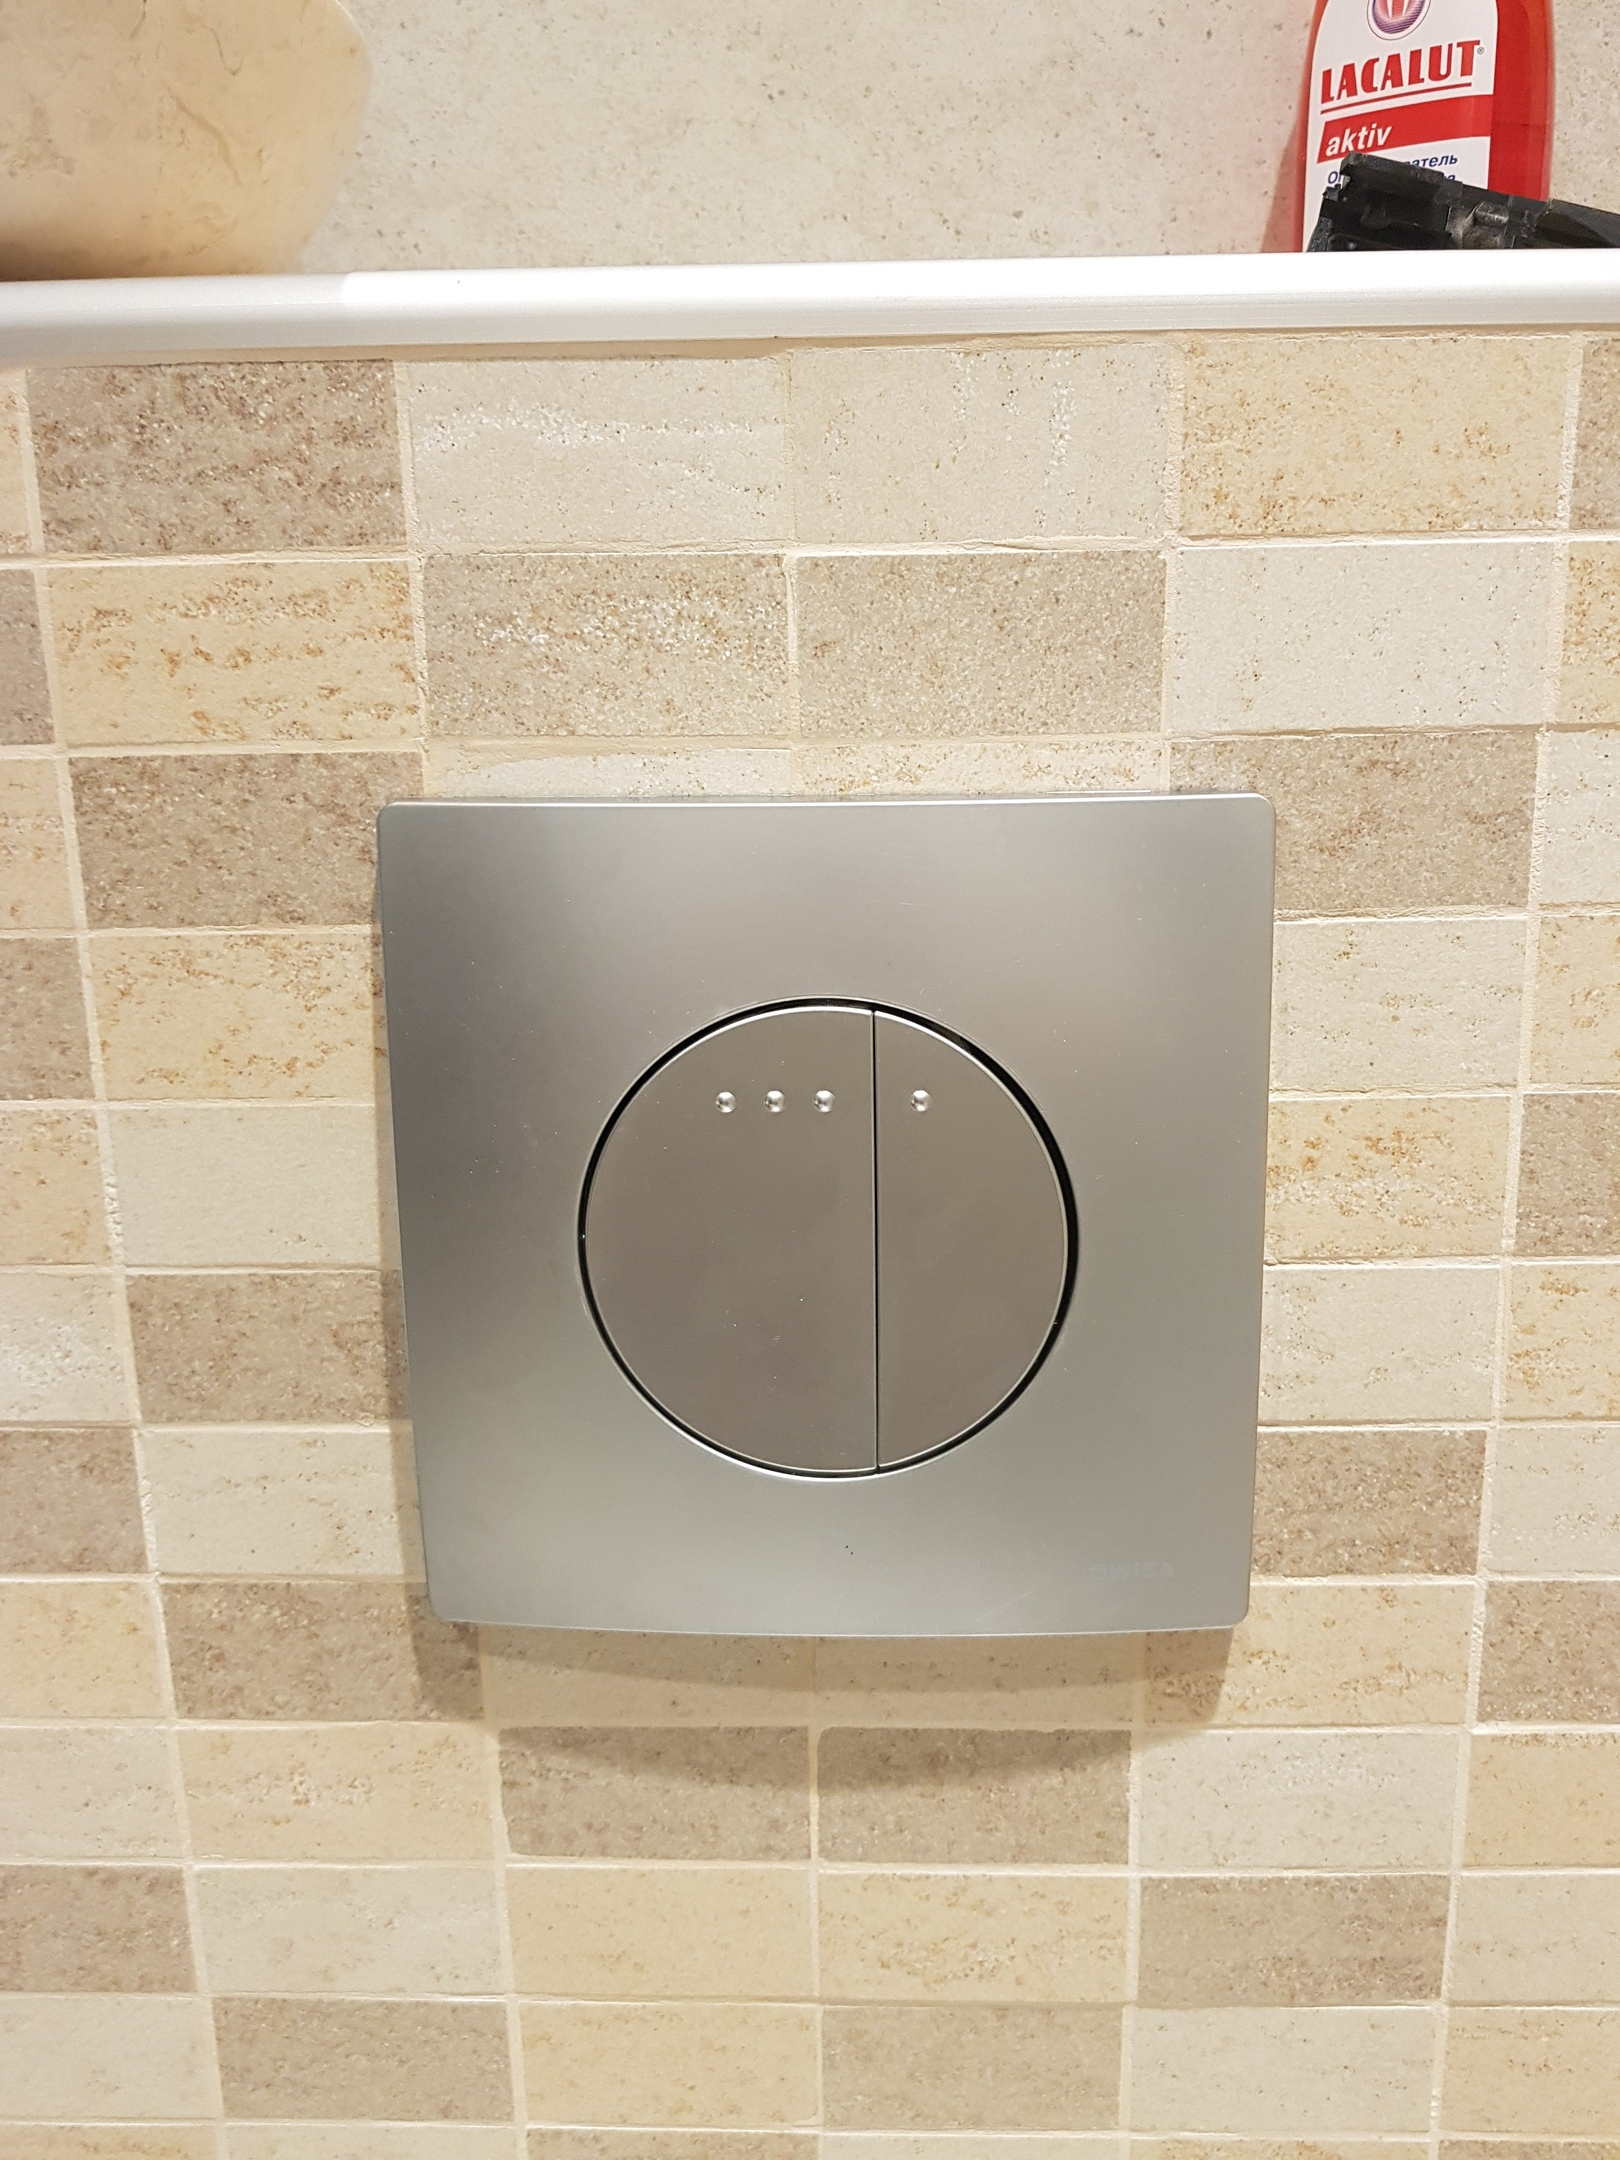 20180108-remont-installacii-wisa-2.jpg